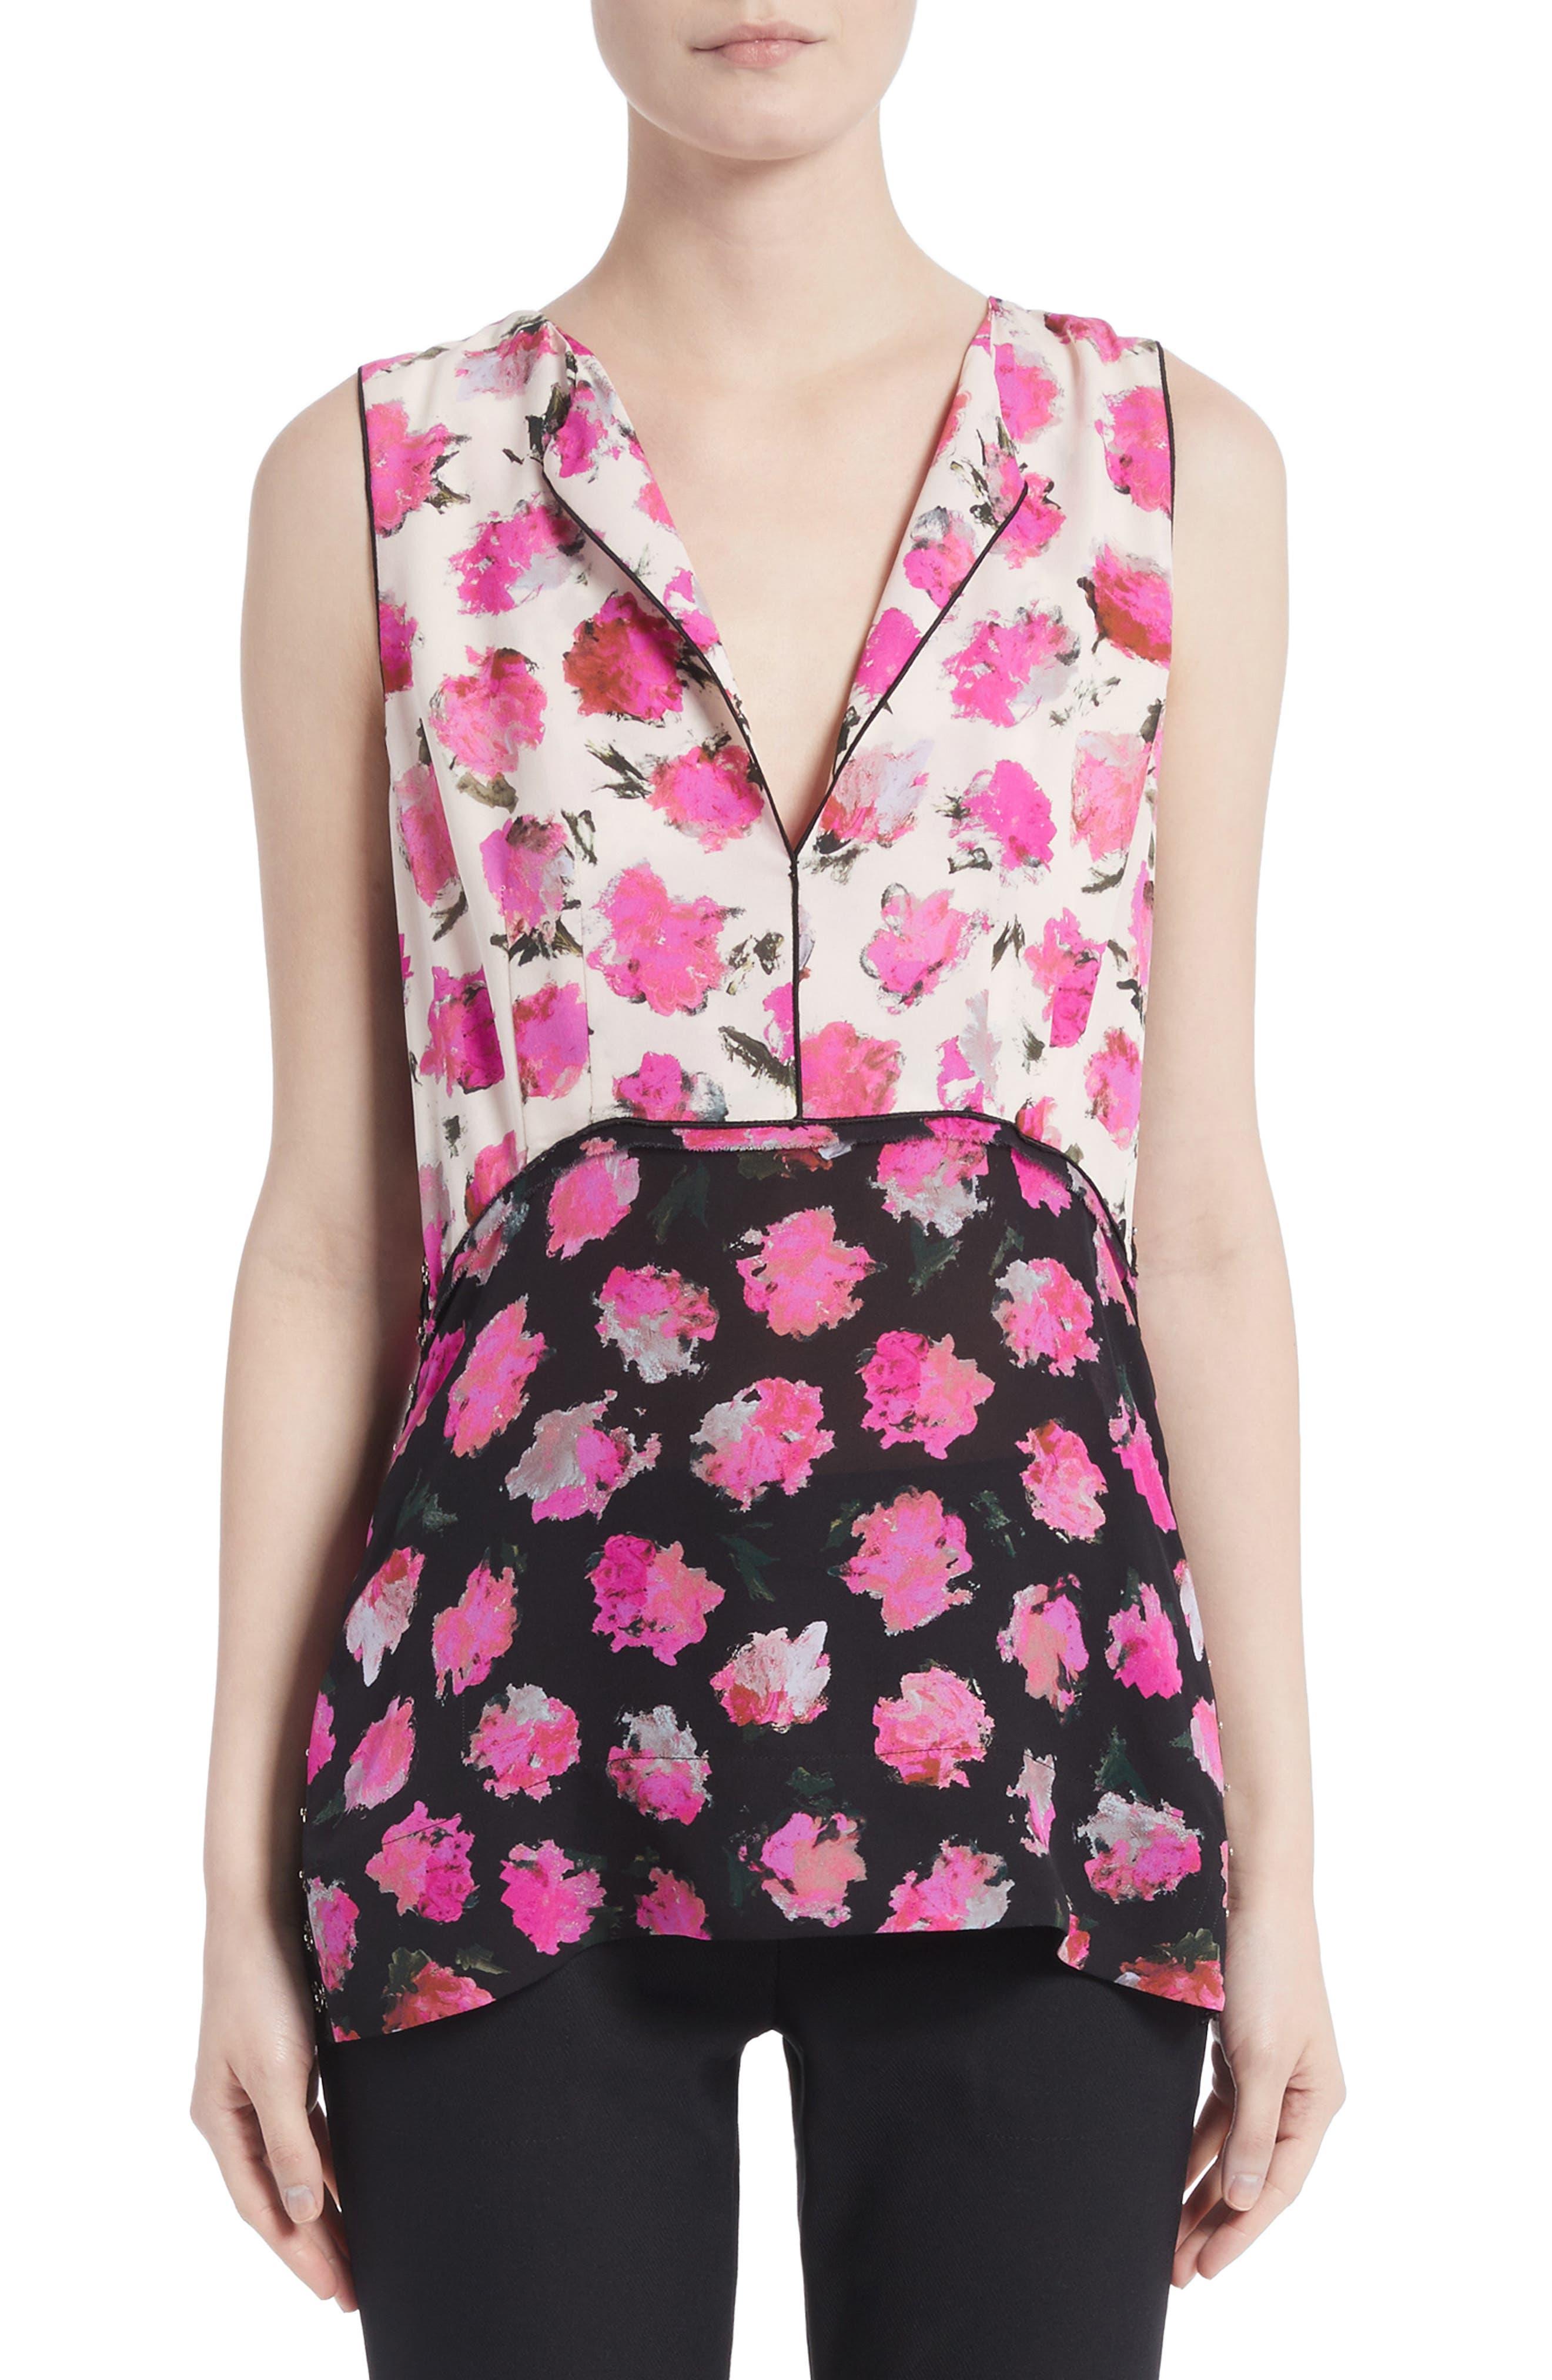 Proenza Schouler Floral Print Silk Georgette Top